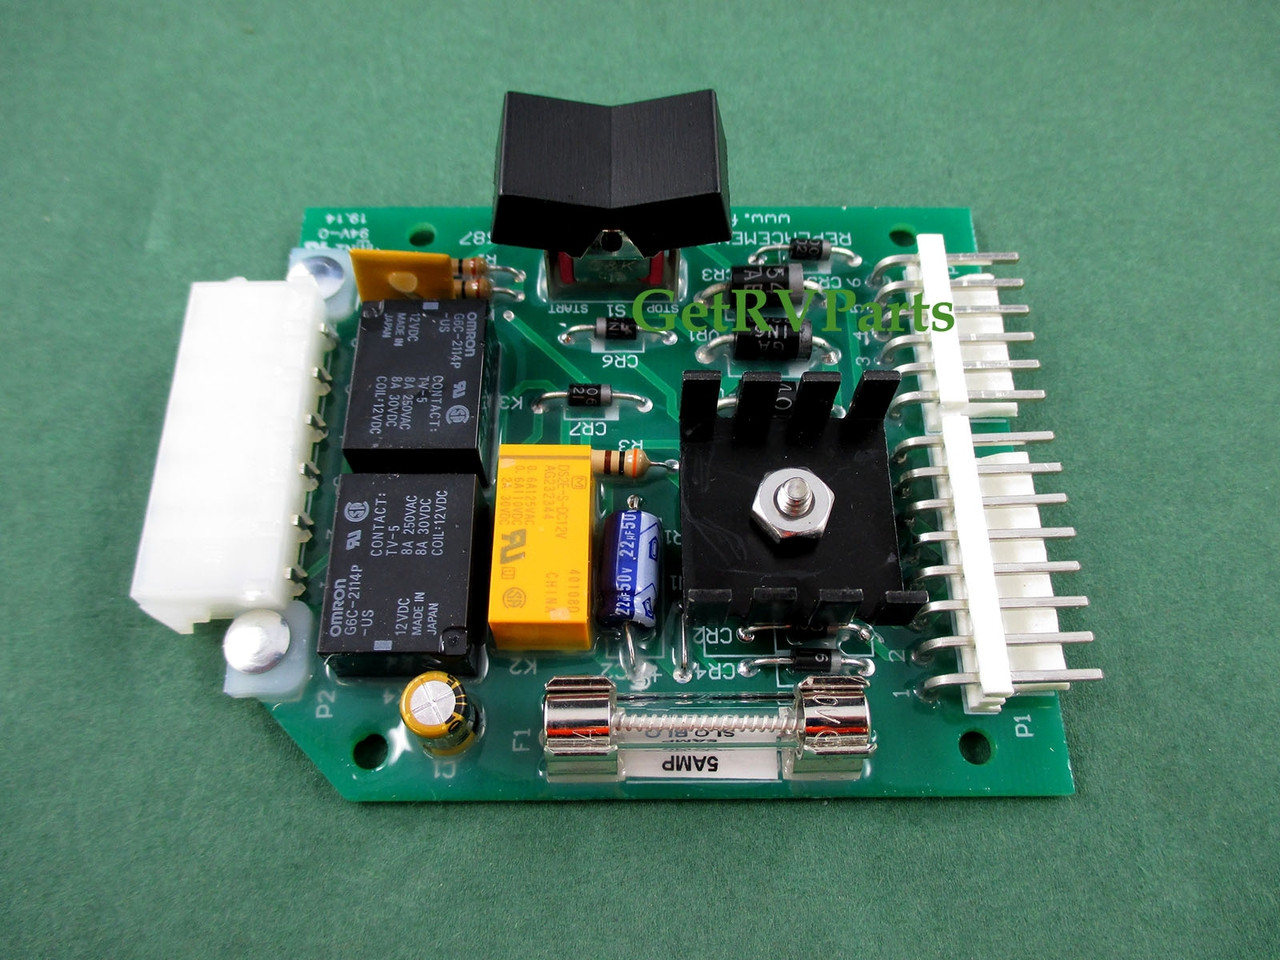 Circuit Boards Onan Sample Diagram Wiring Symbols Generator 300 3056 Board Aftermarket By Flight Systems Rh Getrvparts Com